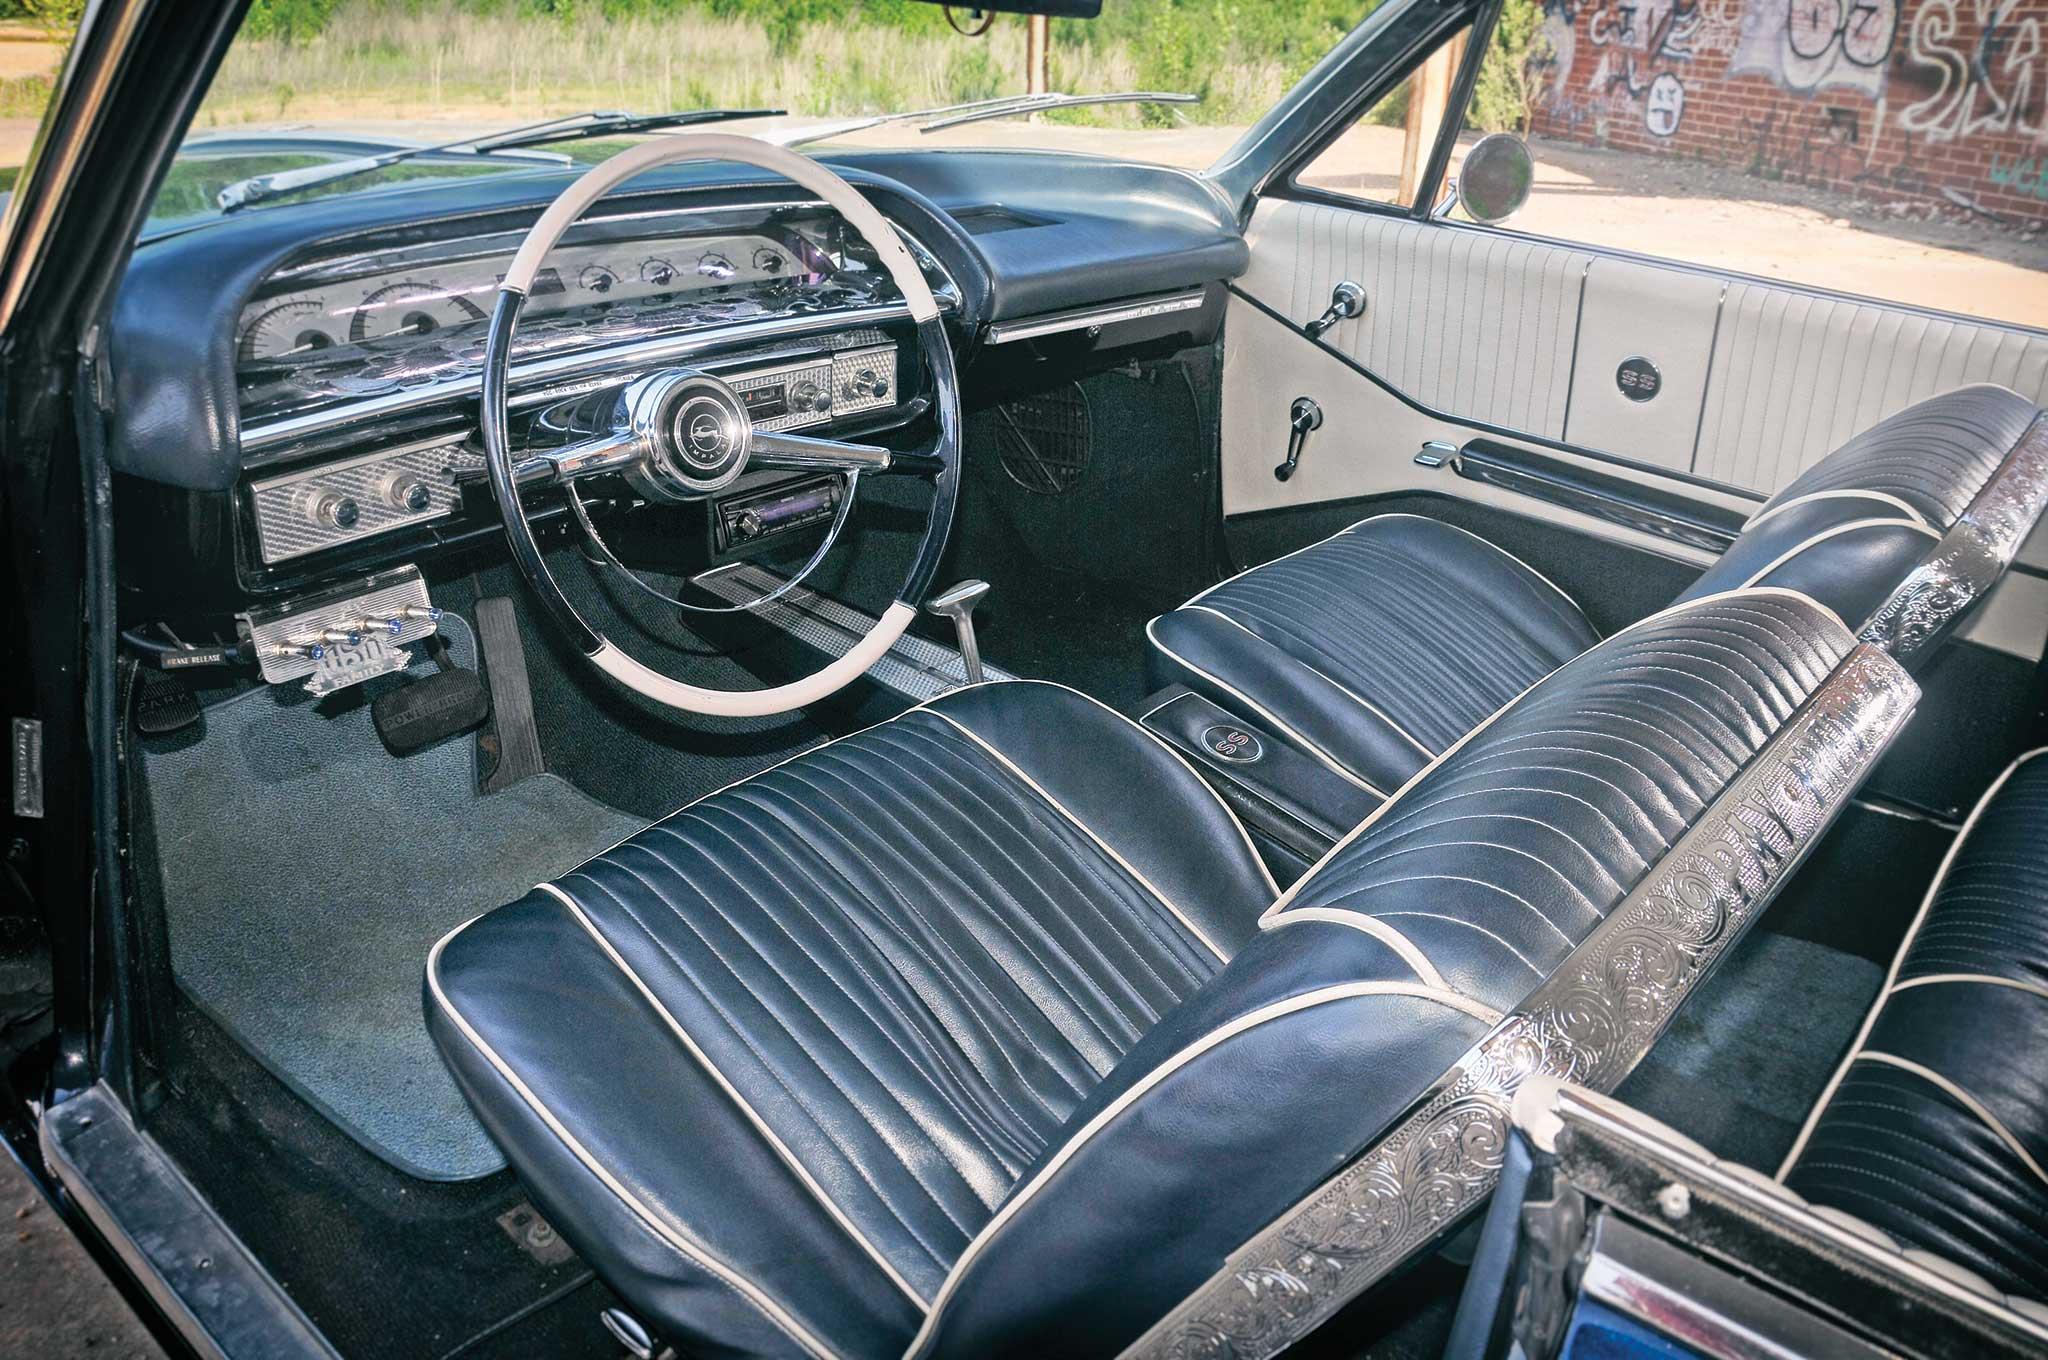 Chevrolet Impala Super Sport Blue And White Leather Interior